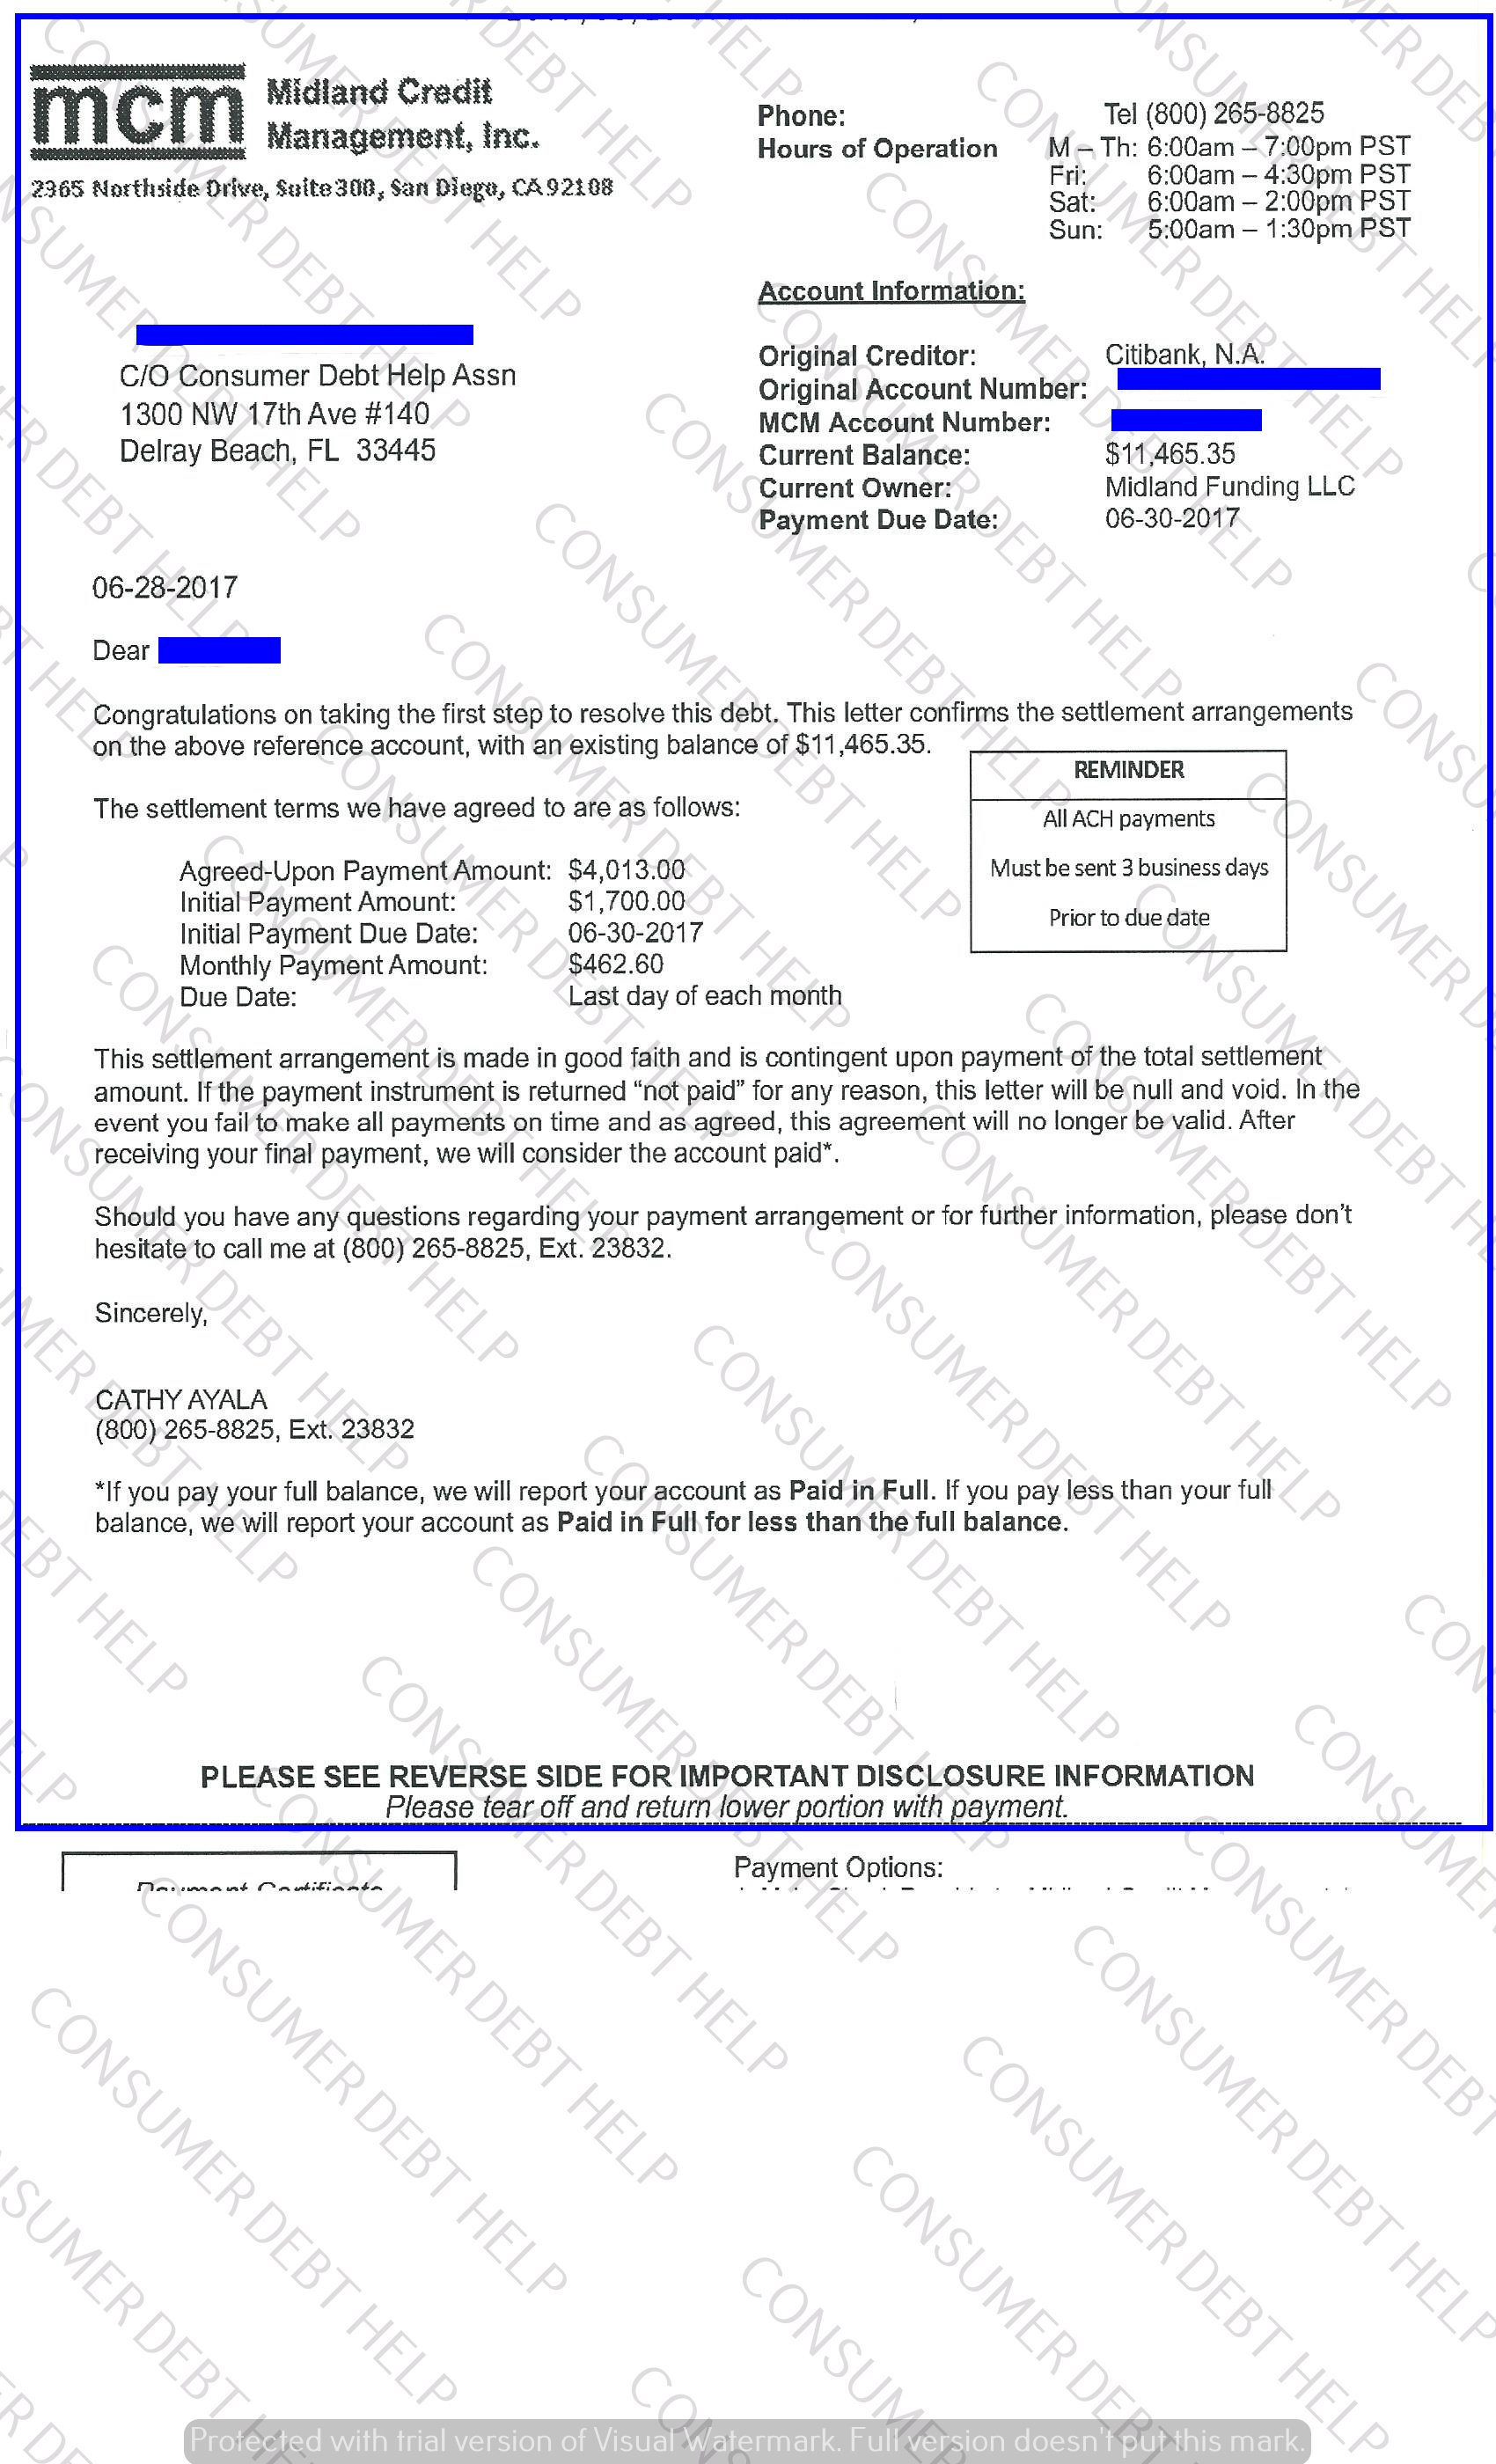 Settlement Letters From ATT Consumer BEBT HELP ASSOCIATION